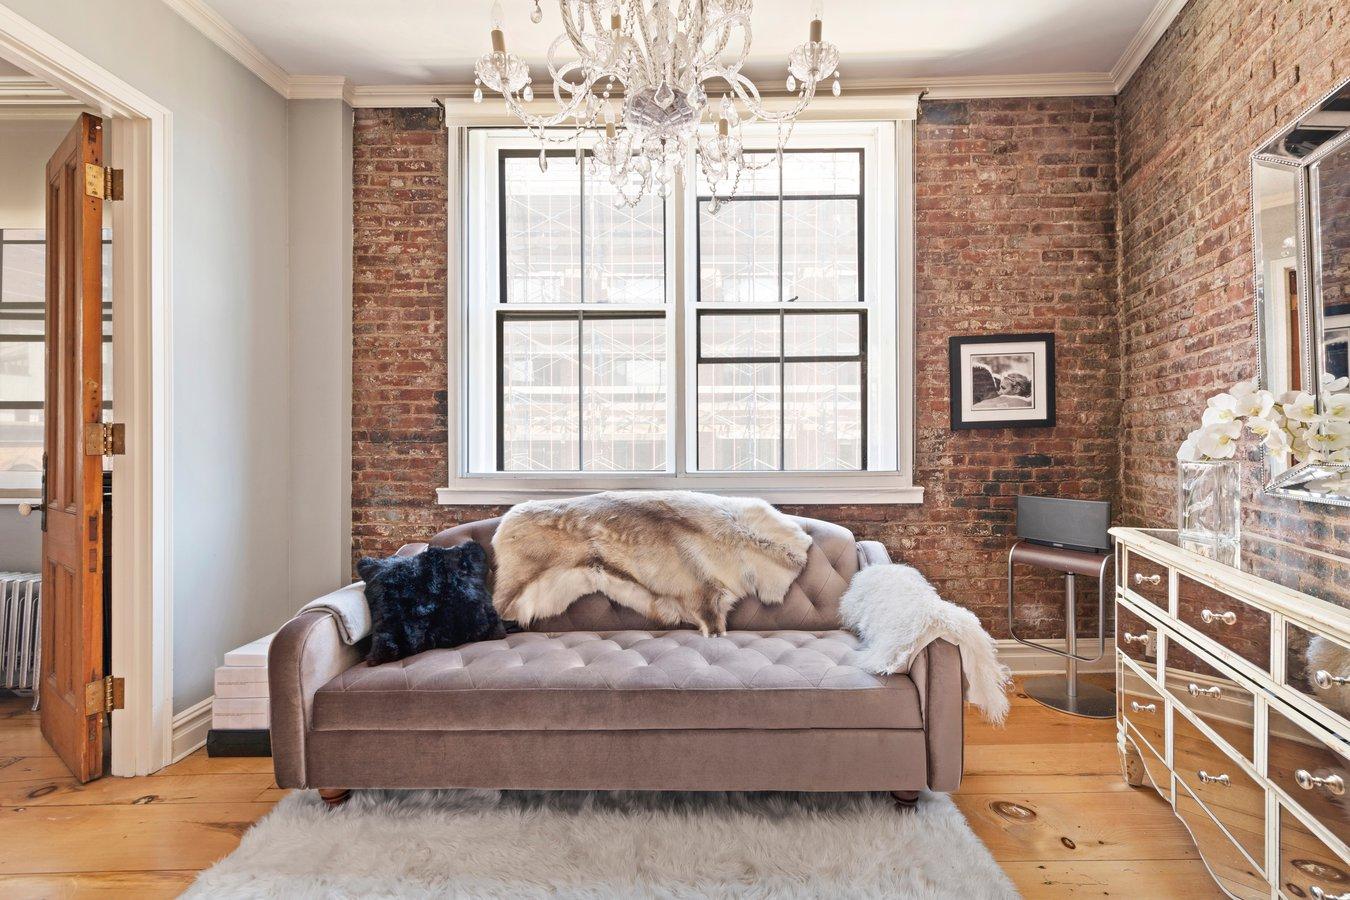 260 West 10th Street W. Greenwich Village New York NY 10014